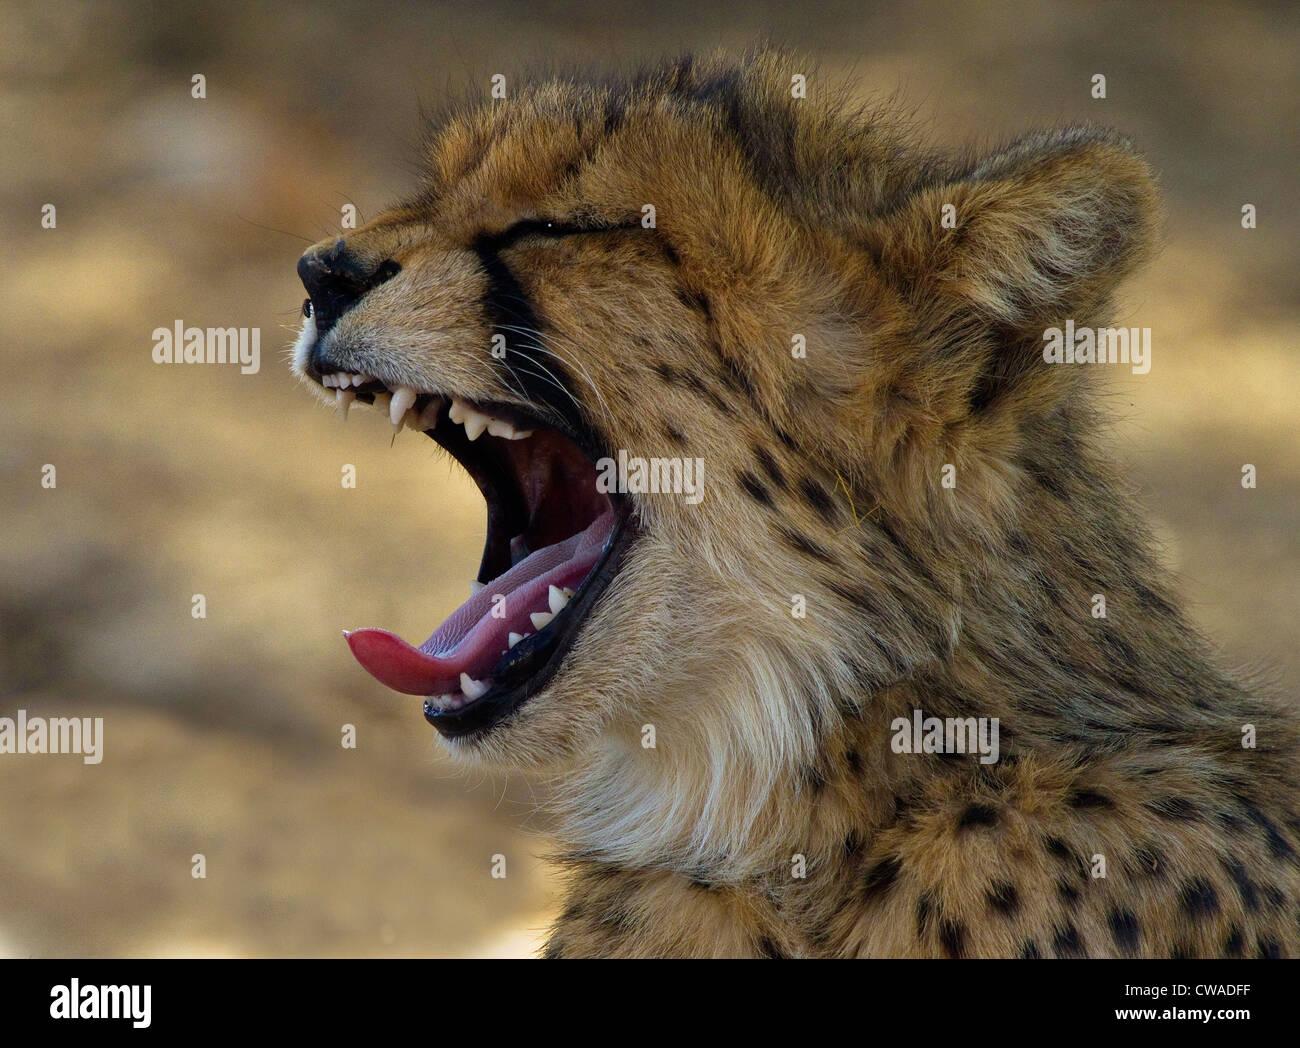 Gepard Cub Gähnen, Kgalagadi Transfrontier Park, Afrika Stockbild